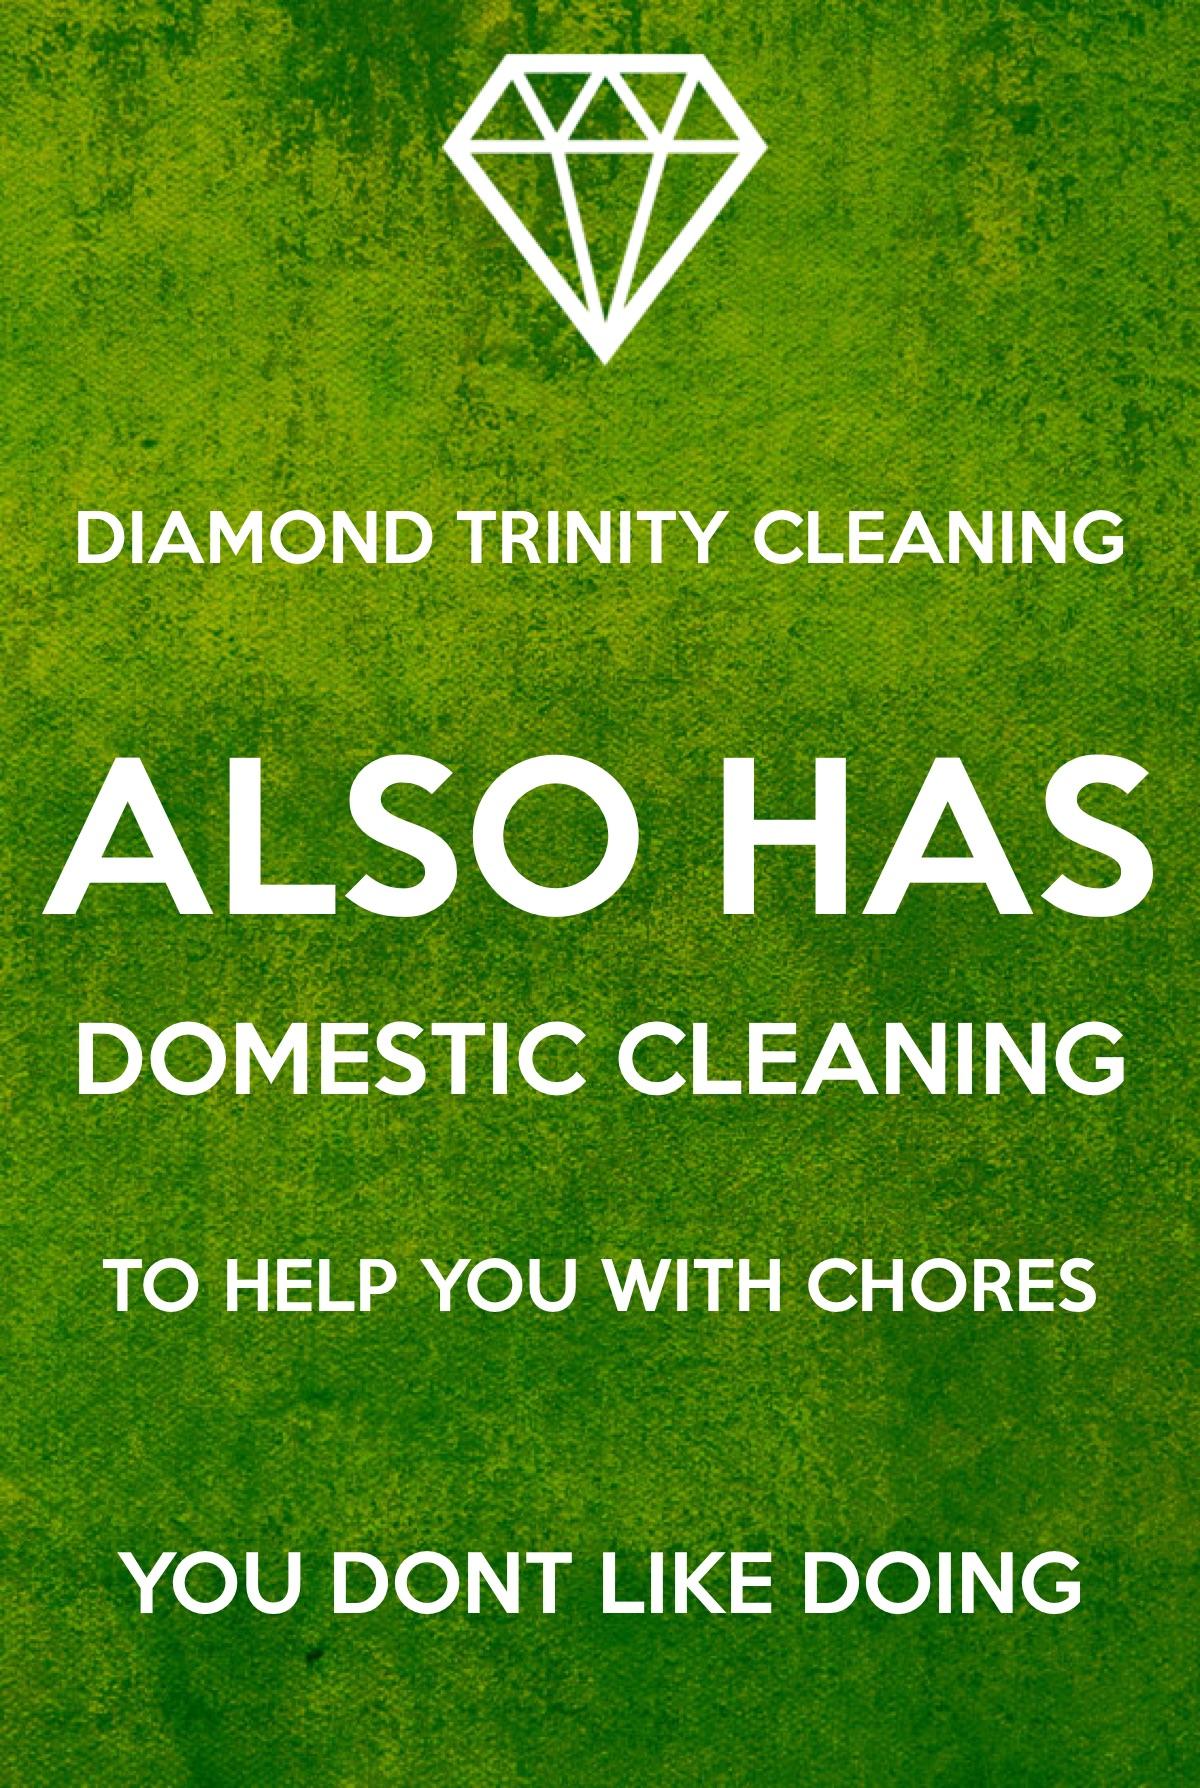 Diamond Trinity Cleaning Service